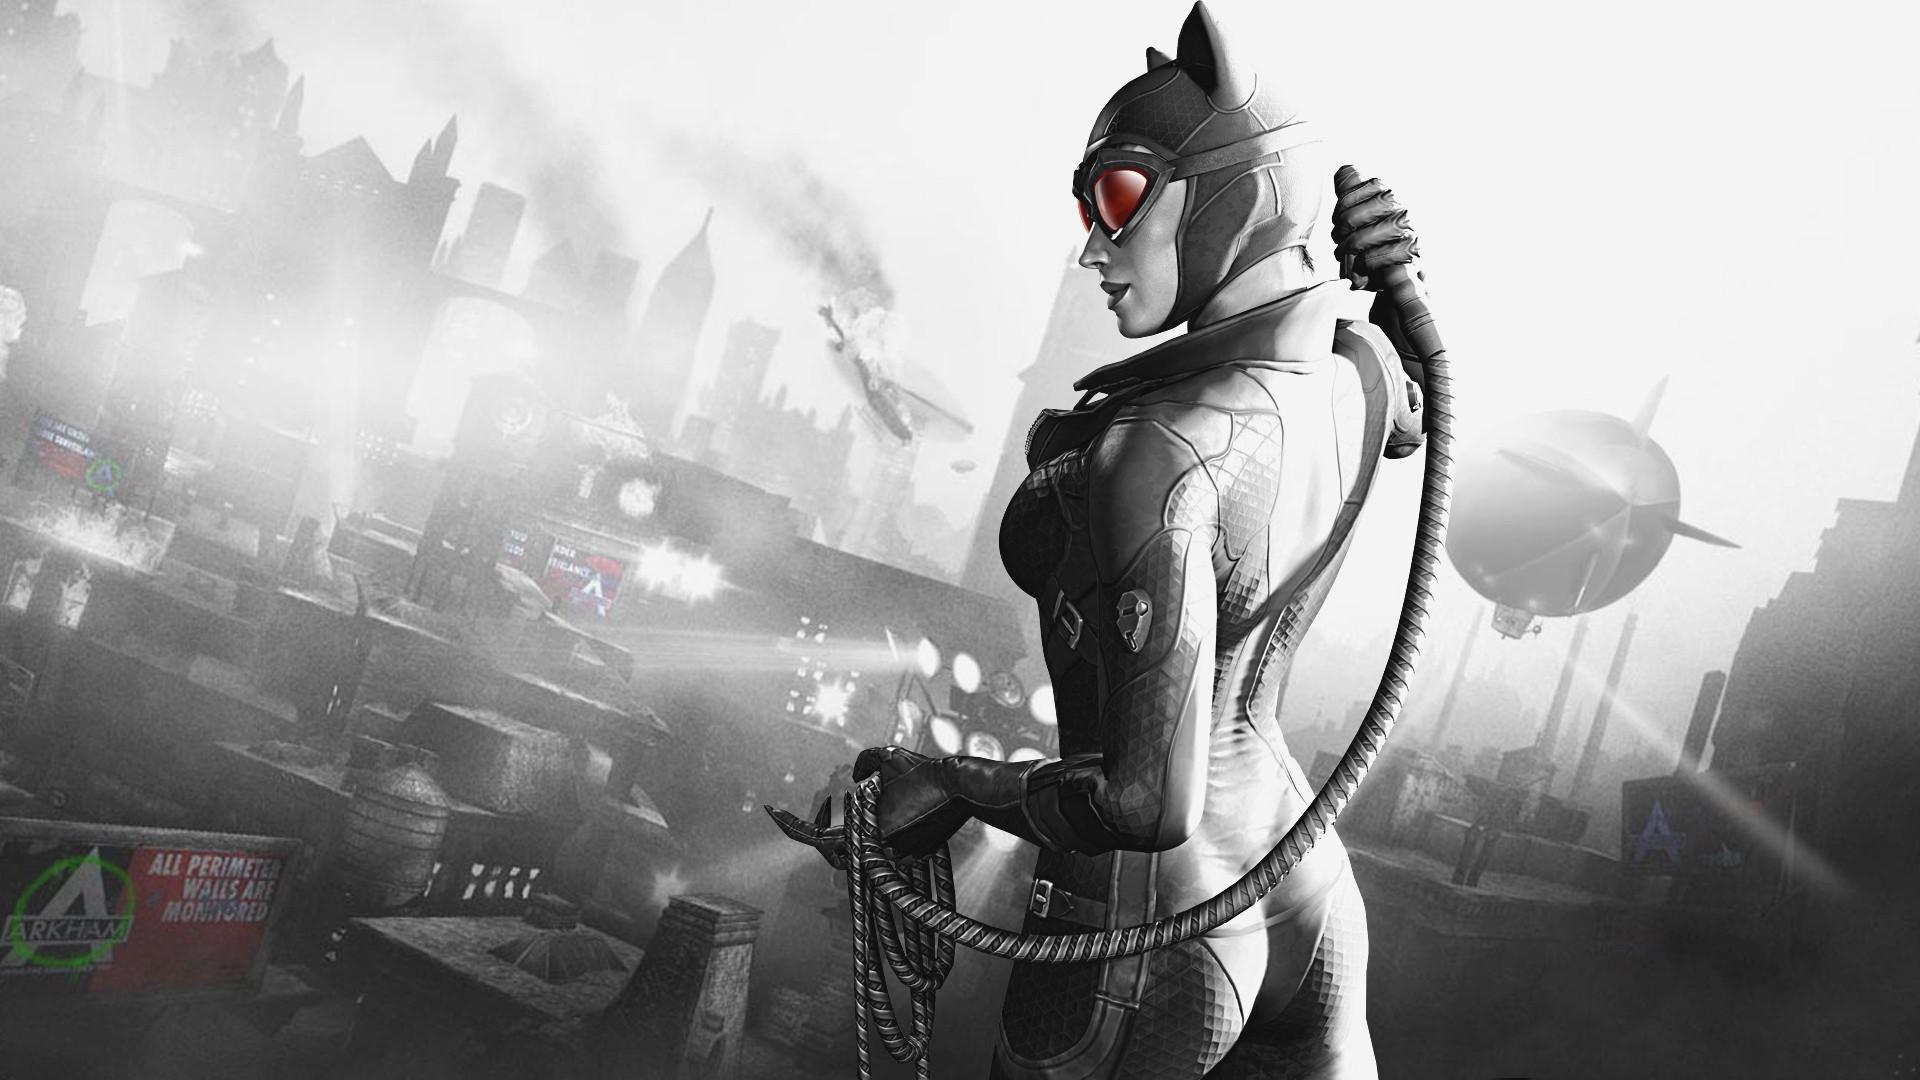 Batman Arkham City wallpapers HD quality